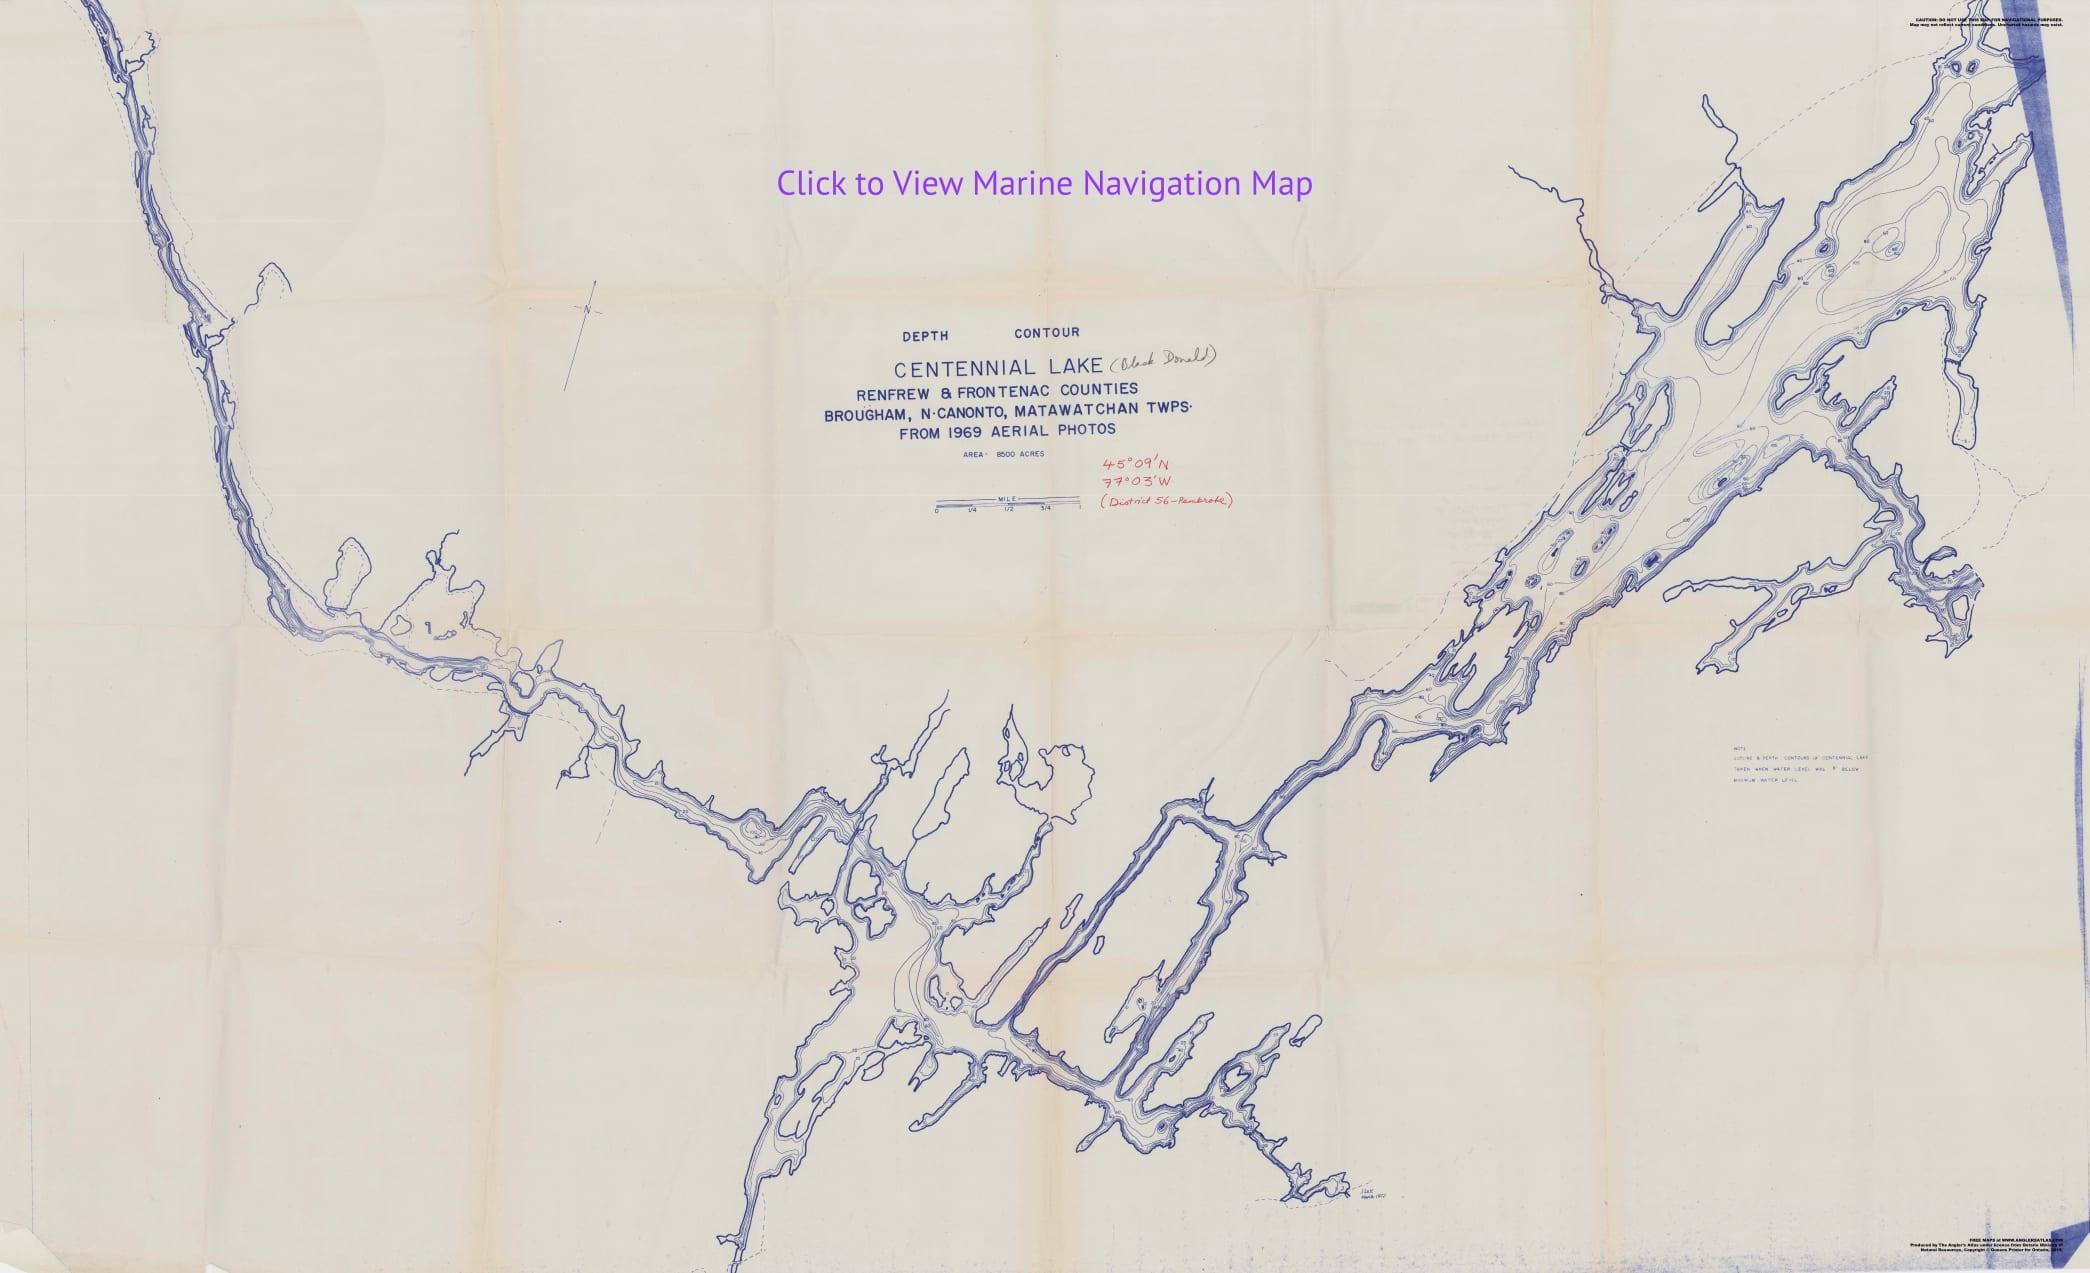 depth contour map of Black Donald and Centennial Lake